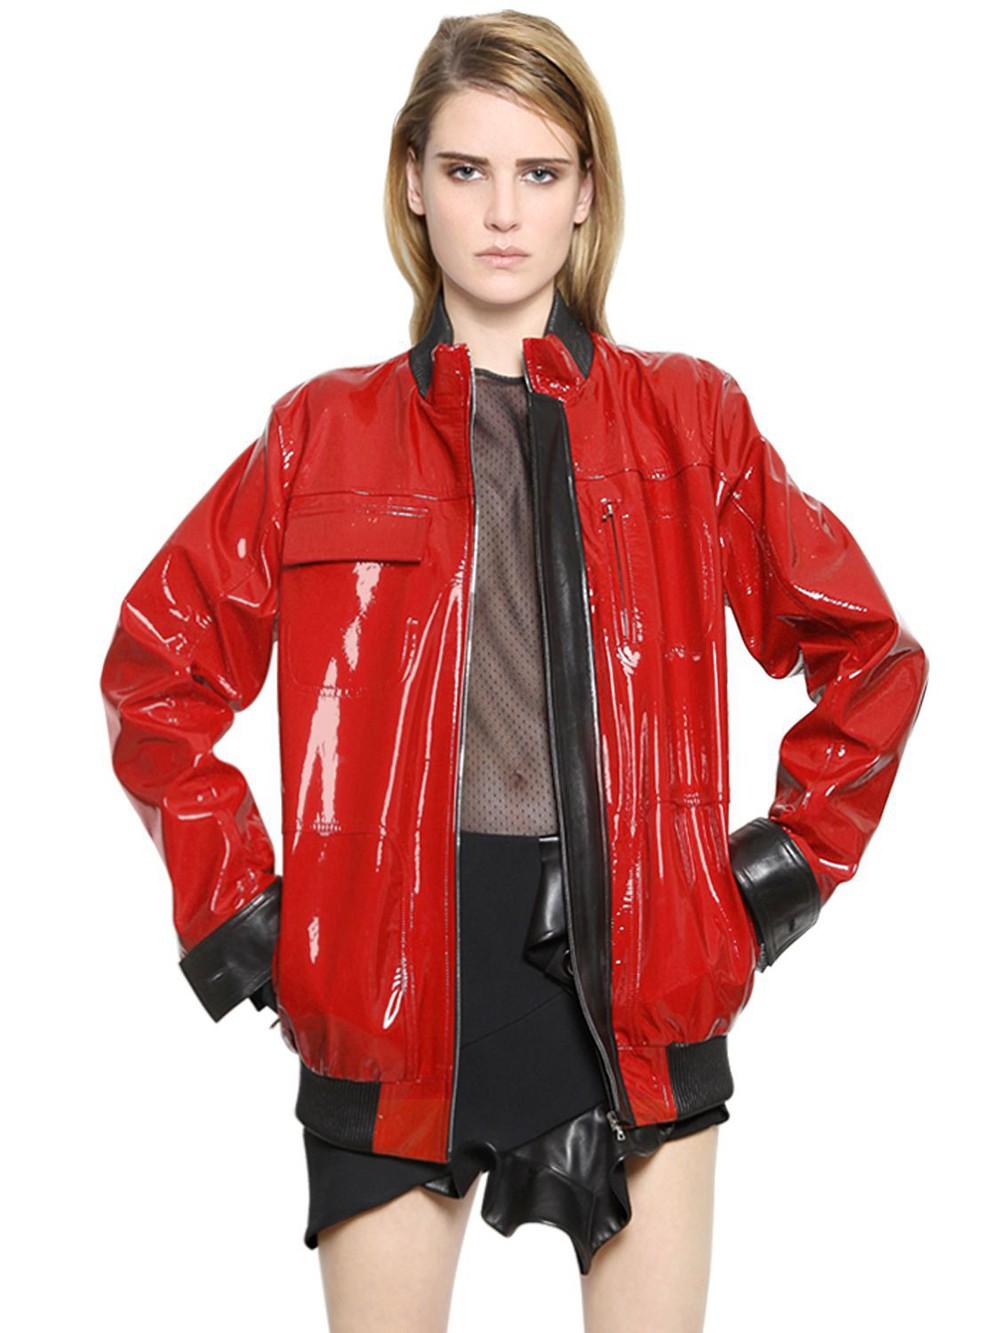 Acne Studios Velocite Shearling Moto Jacket Red